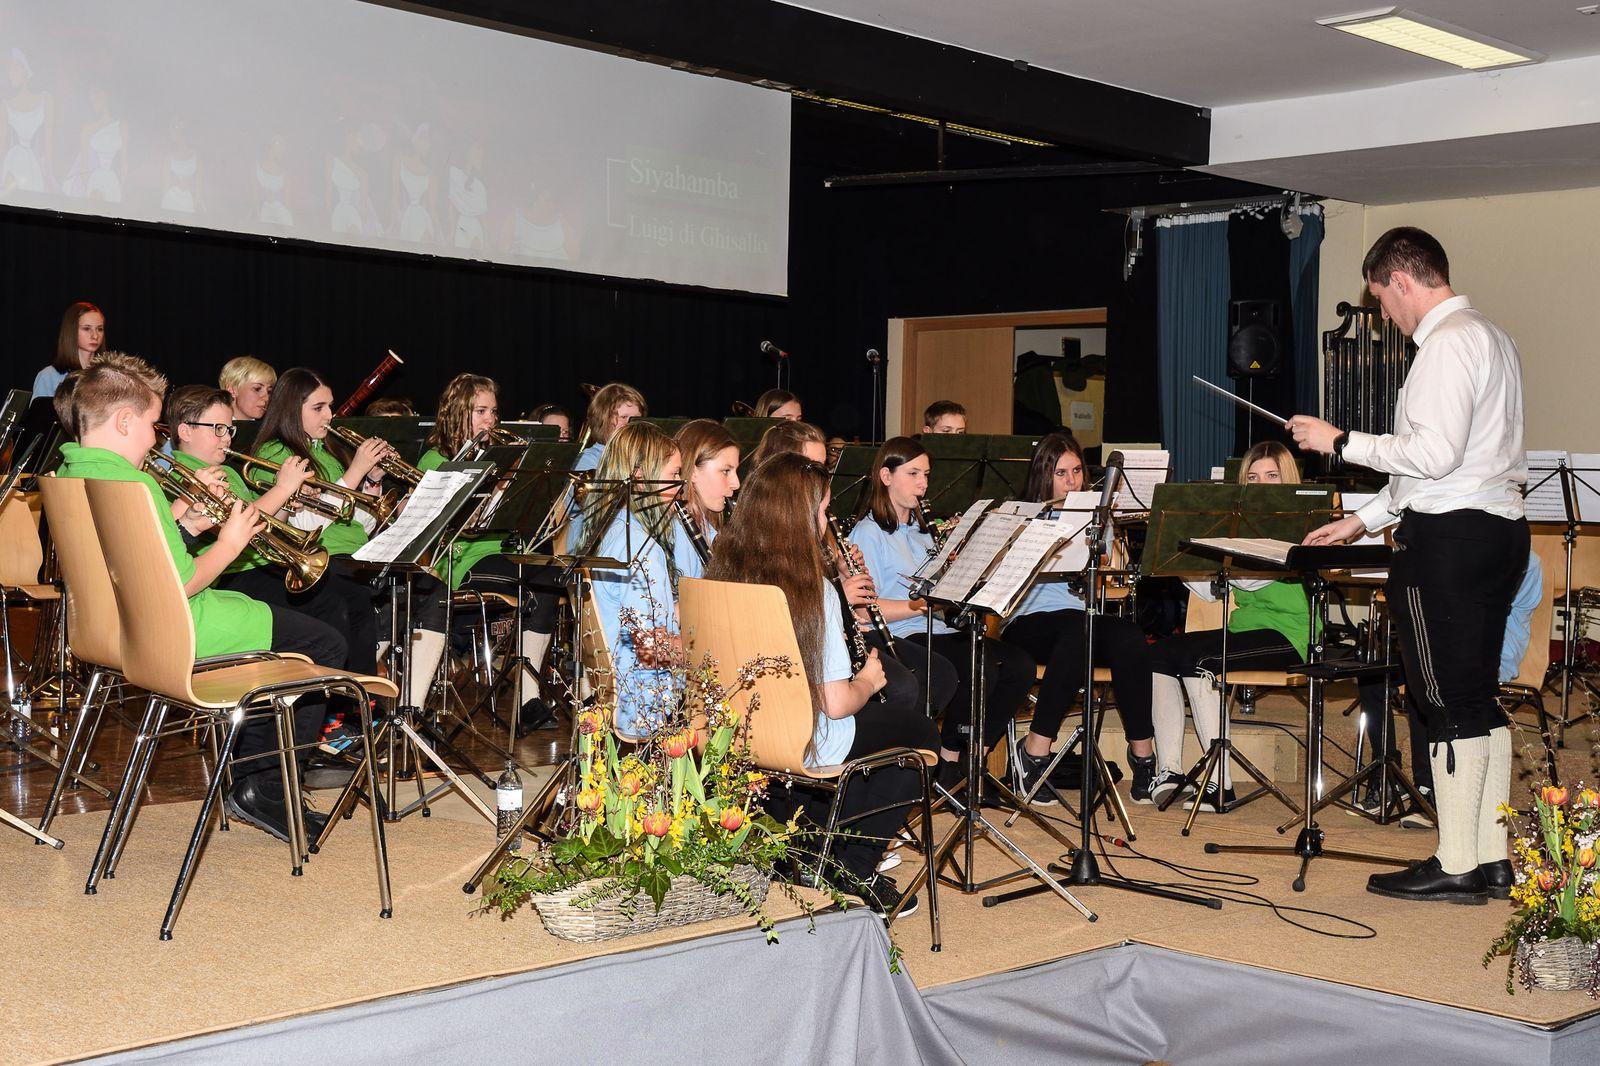 2017.04.02 - Auftritt Jugendkapelle Sandl-St. Oswald - D72_2747_kl